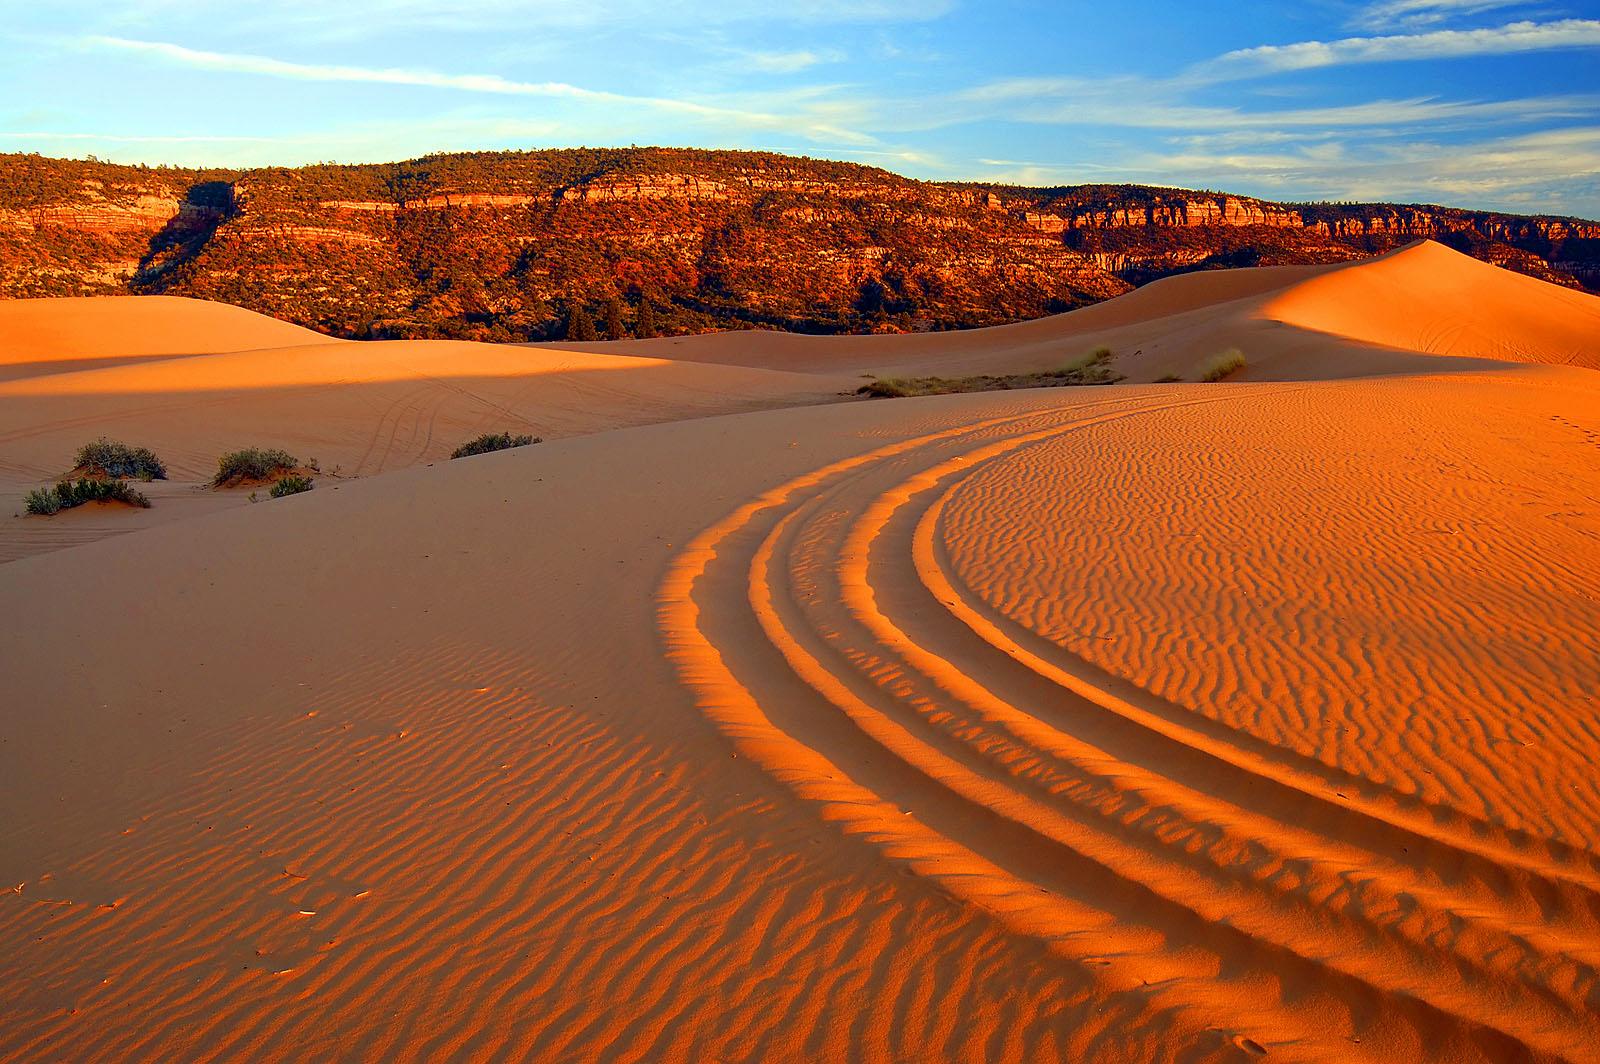 coral-pink-sand-dunes-four-wheeler-tracks-tyler-cornell-kcot